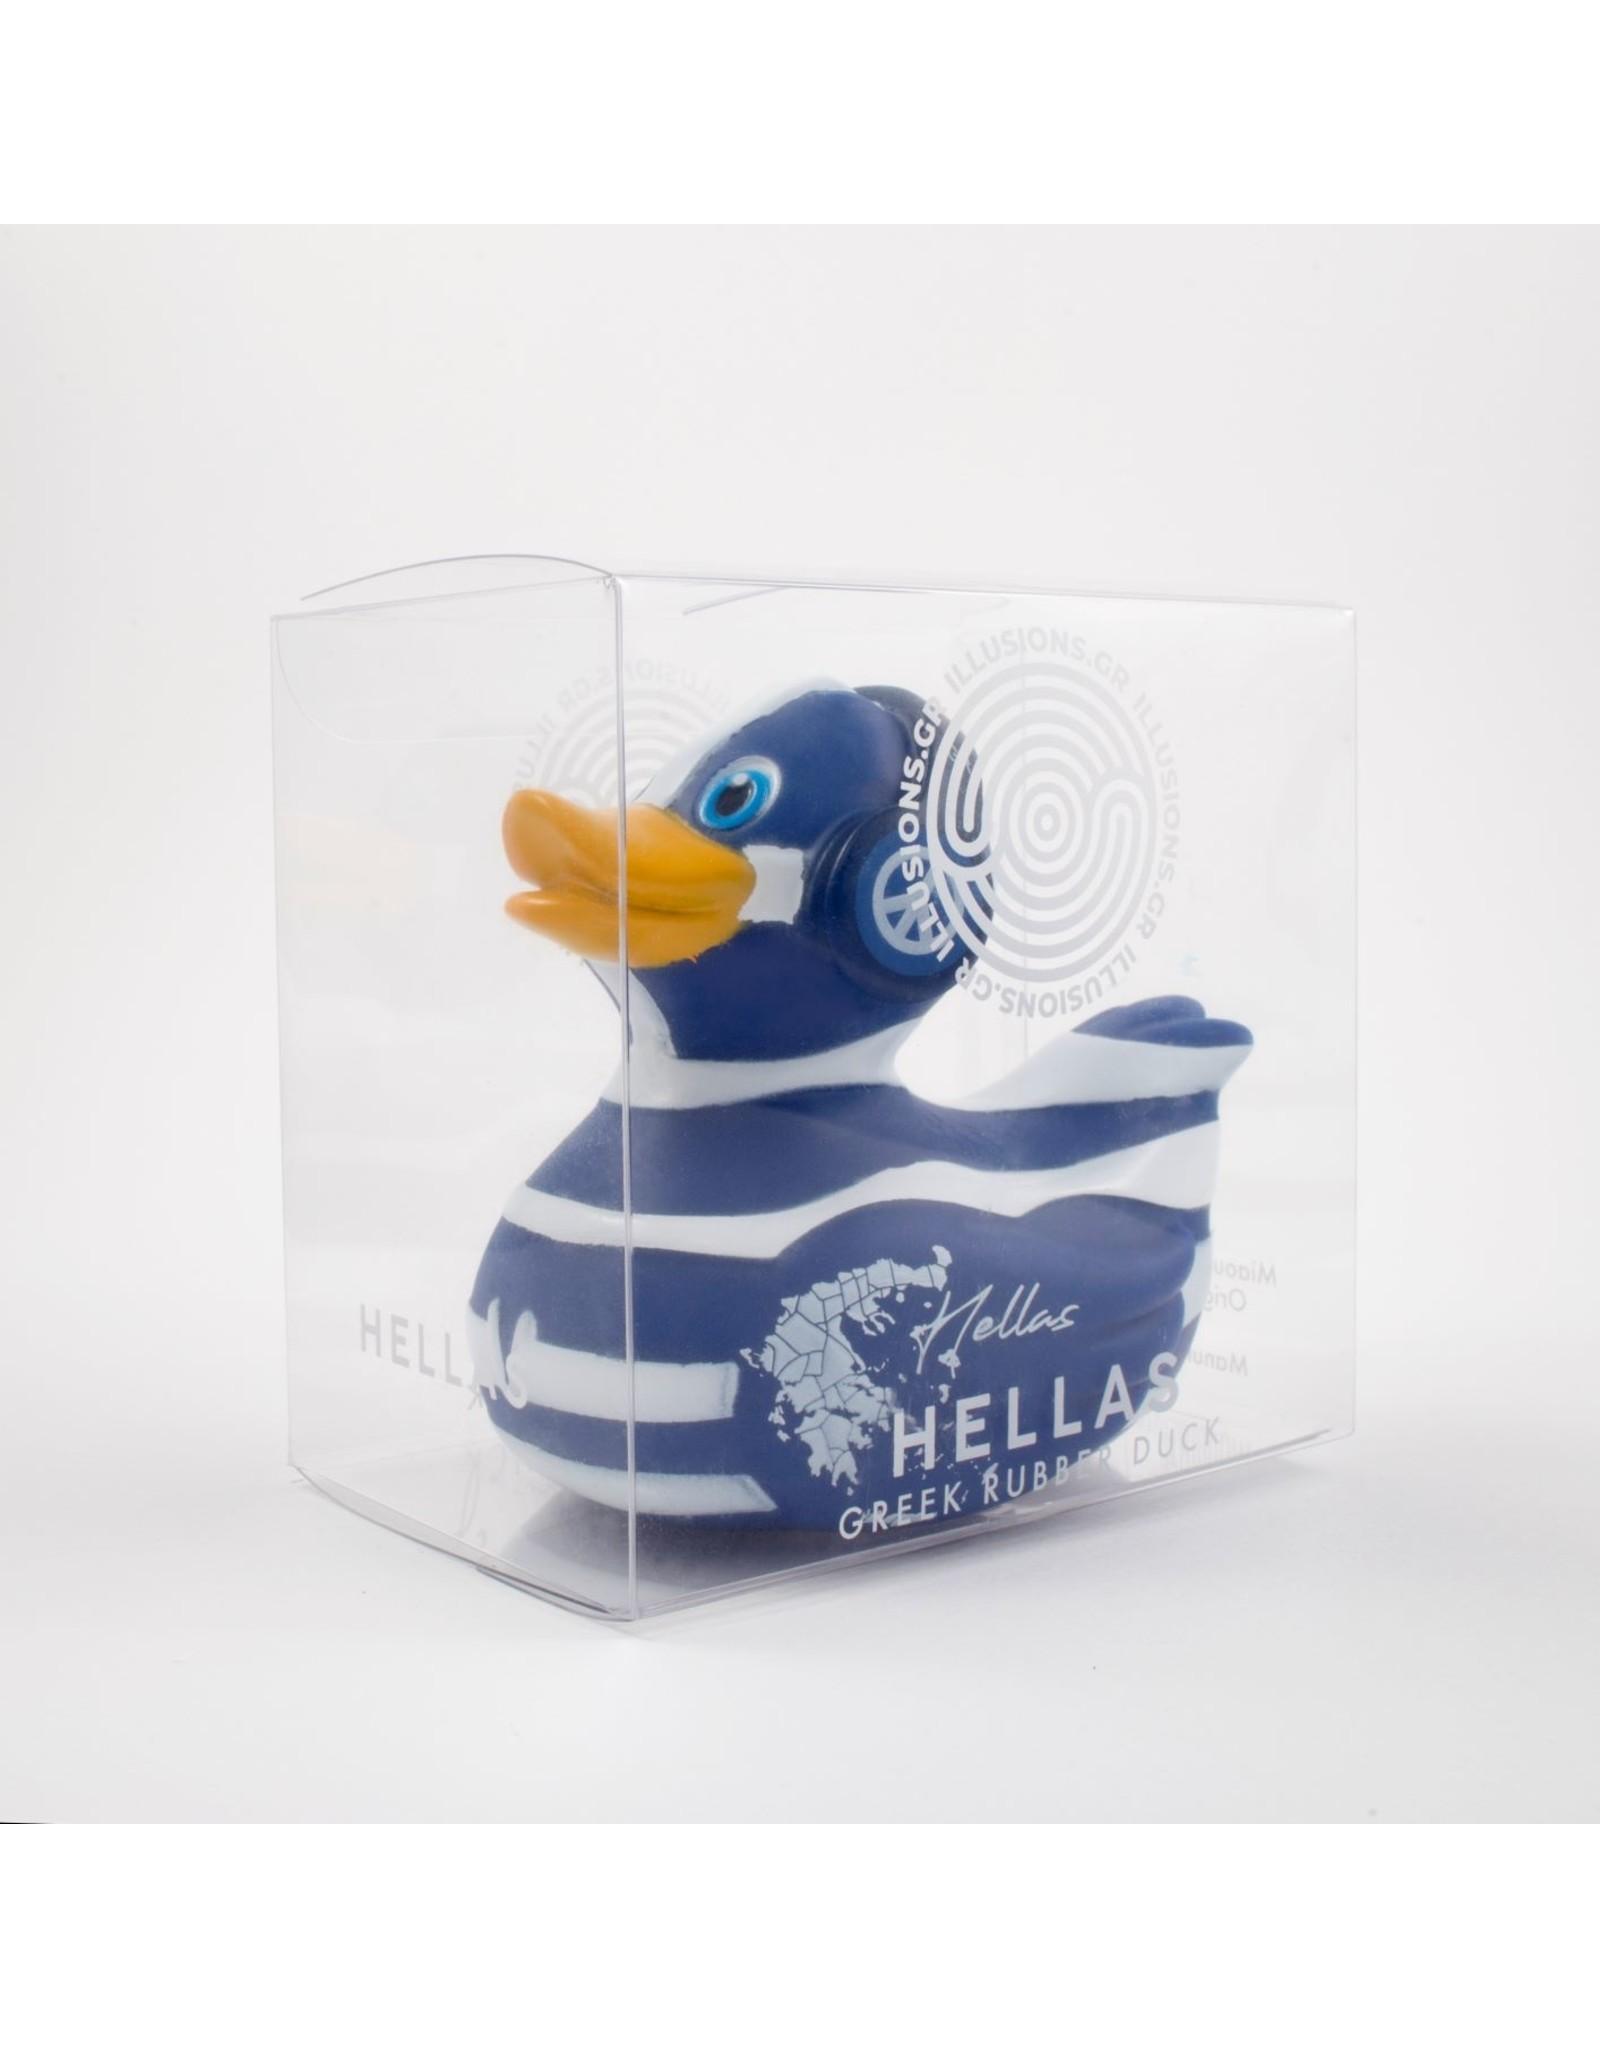 Illusions Hellas - Greek Flag Rubber Duck